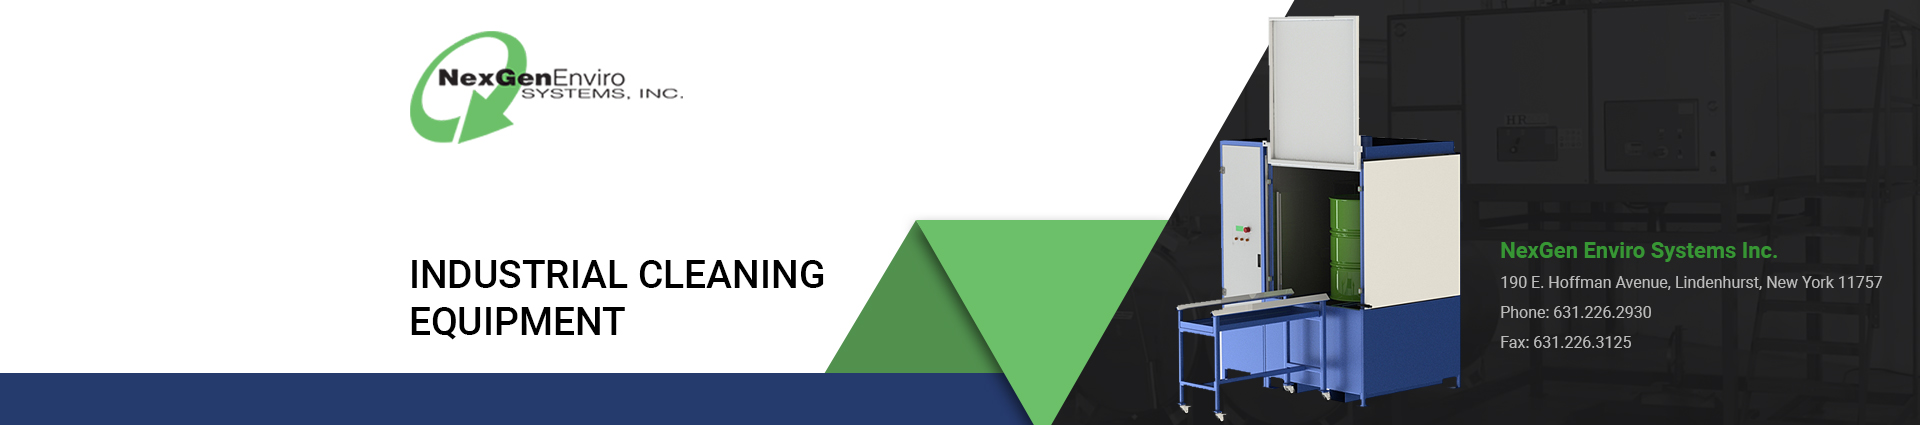 industrial-cleaning-equipment banner2 Nexgen Enviro Systems Inc